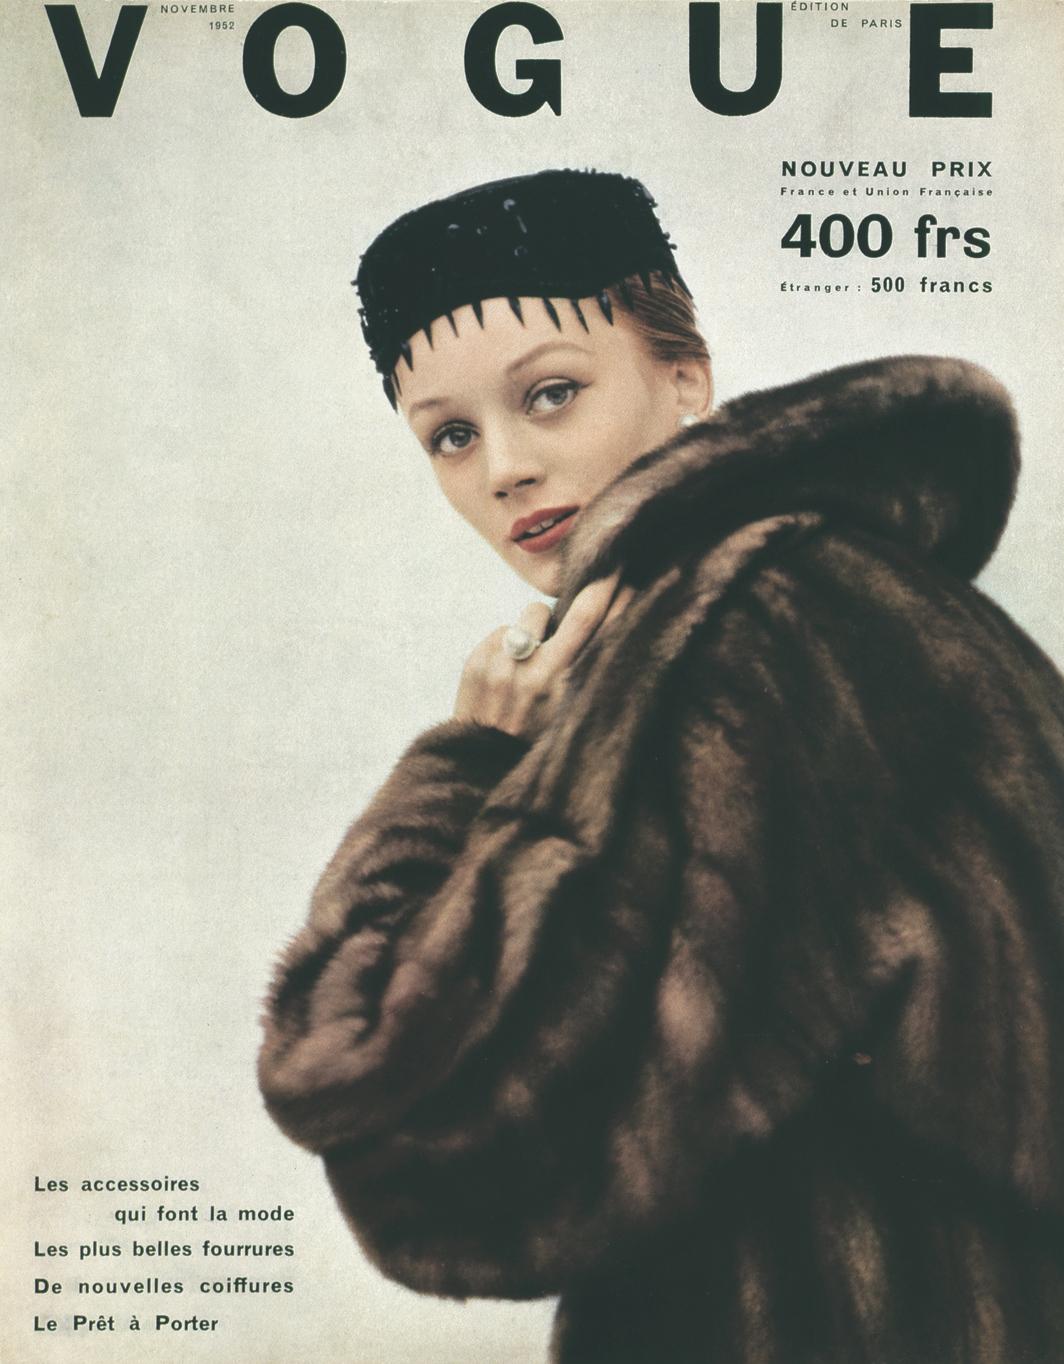 Cover of Vogue Paris, November 1952. Niki de Saint Phalle.